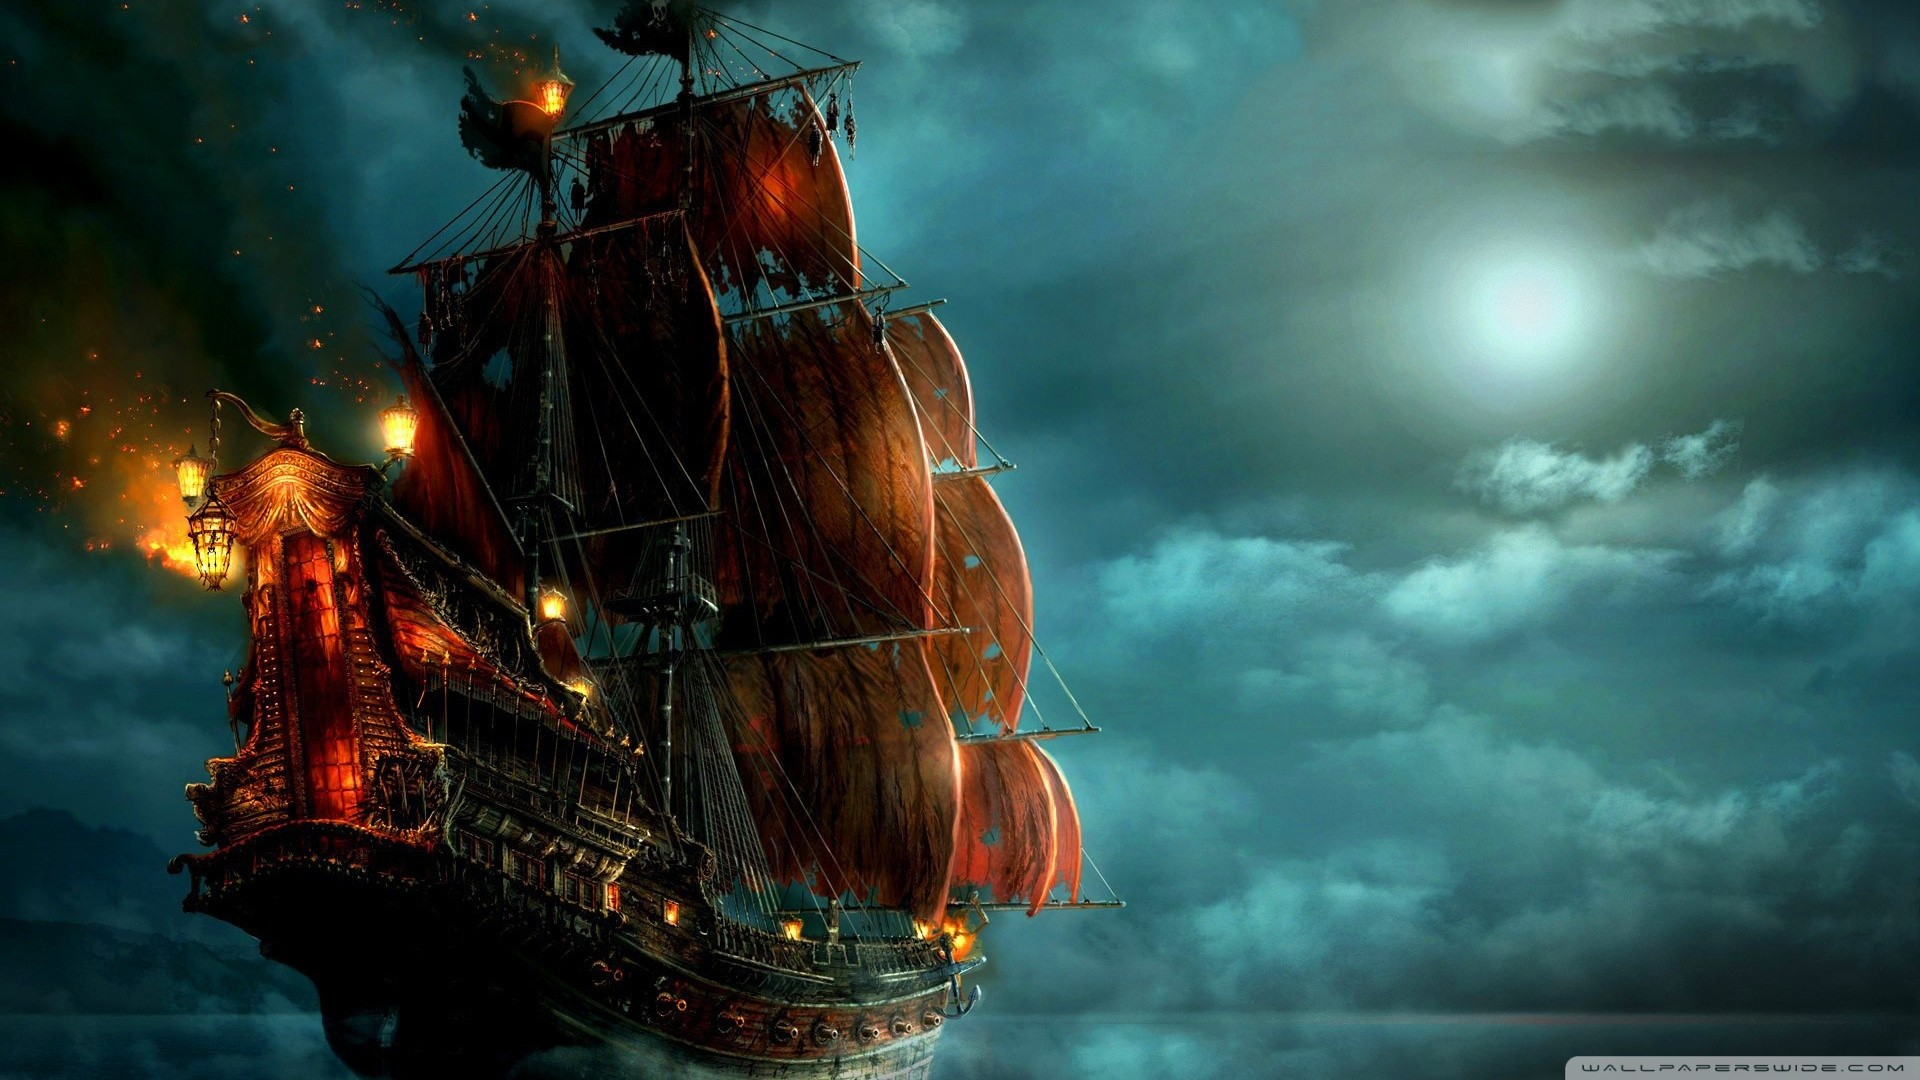 Old Sailing Ship on Fire gaming games images pictures screenshots  GameScapes GamingShot concept digital art VistaLore